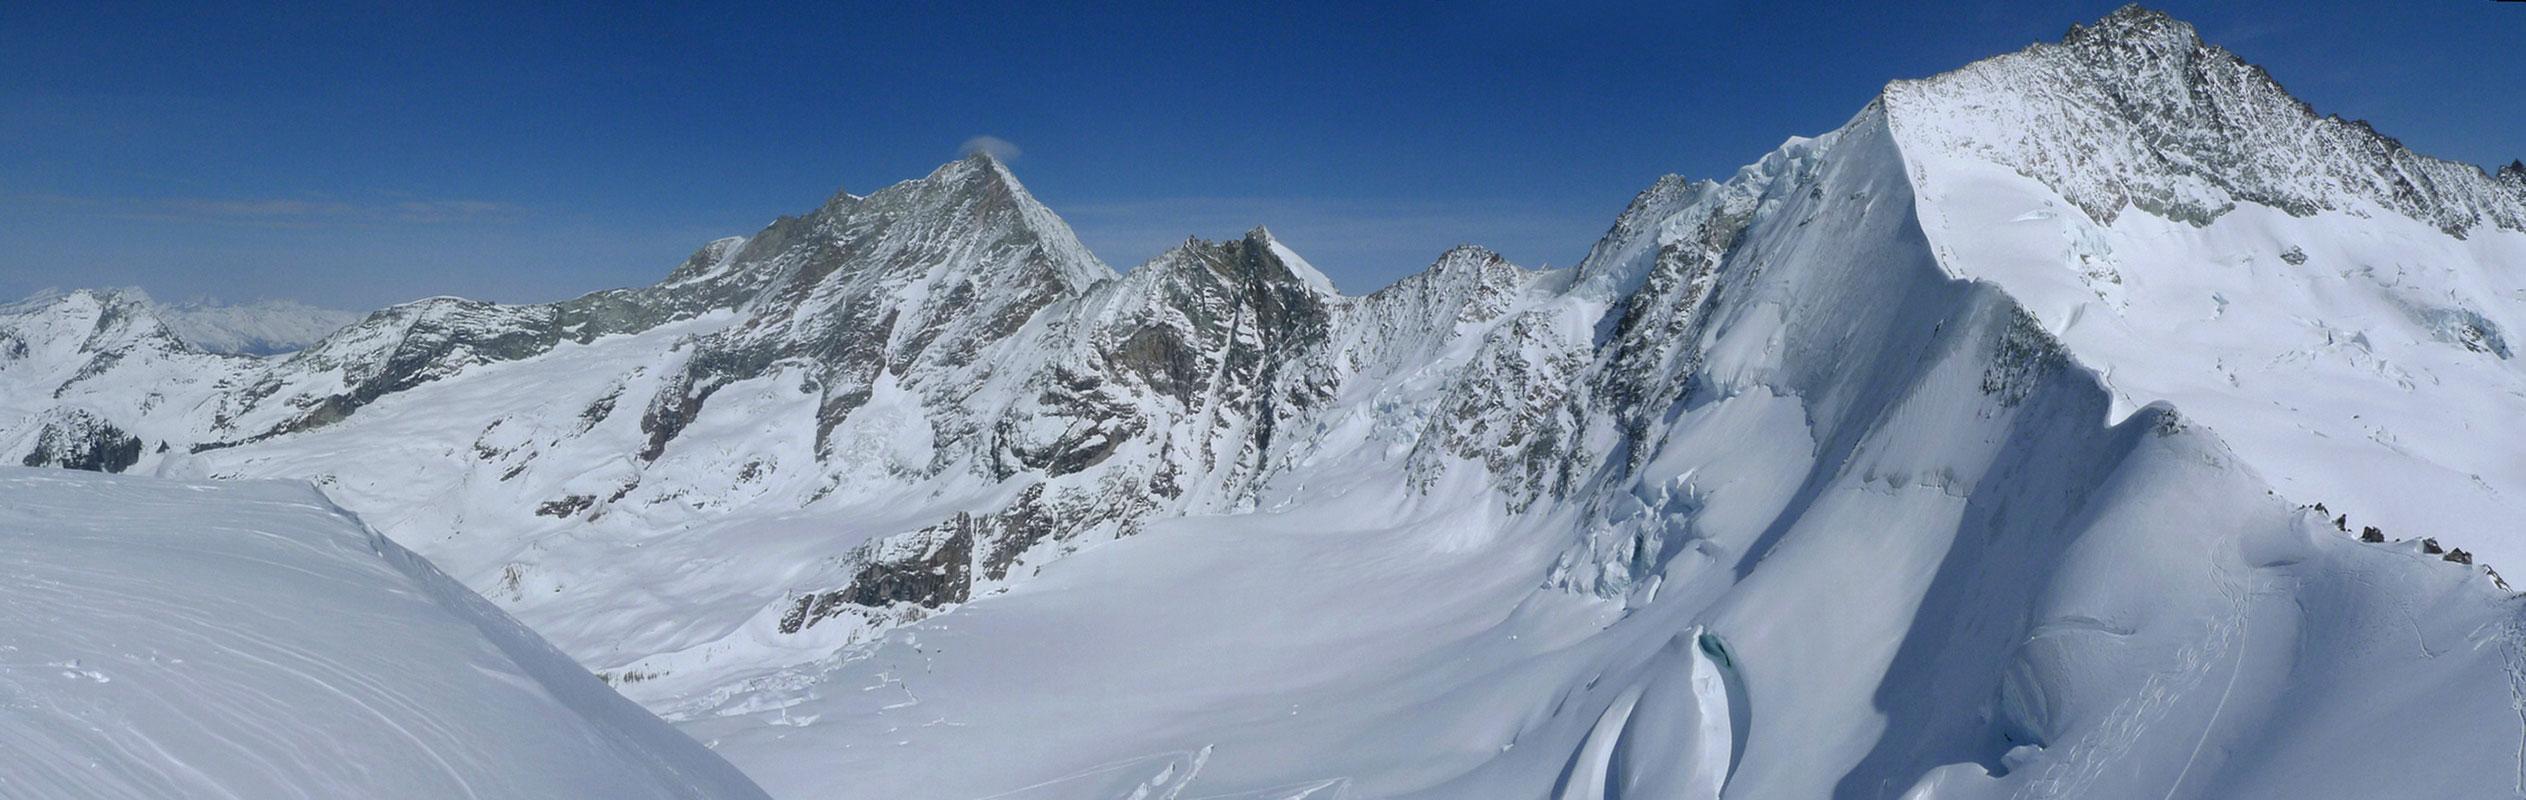 Blanc de Moming - Dôme Circuit Walliser Alpen / Alpes valaisannes Switzerland panorama 35